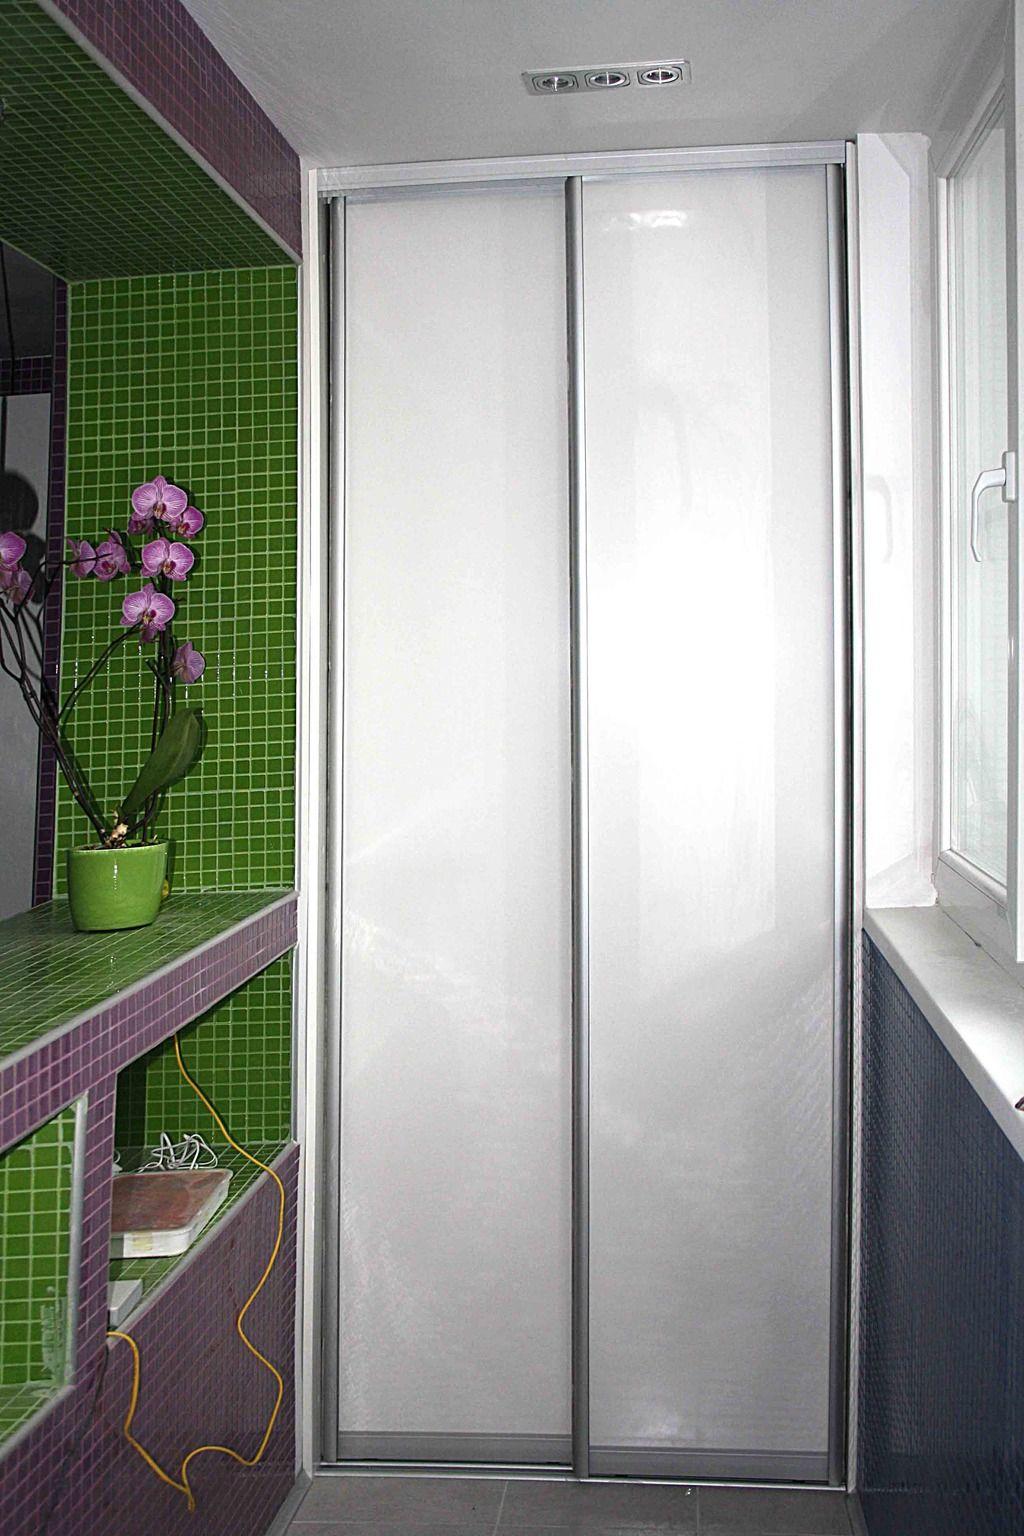 Simple Design Glass Sliding Door For Pantry Closet Modern Closet Doors Sliding Closet Doors Glass Closet Doors